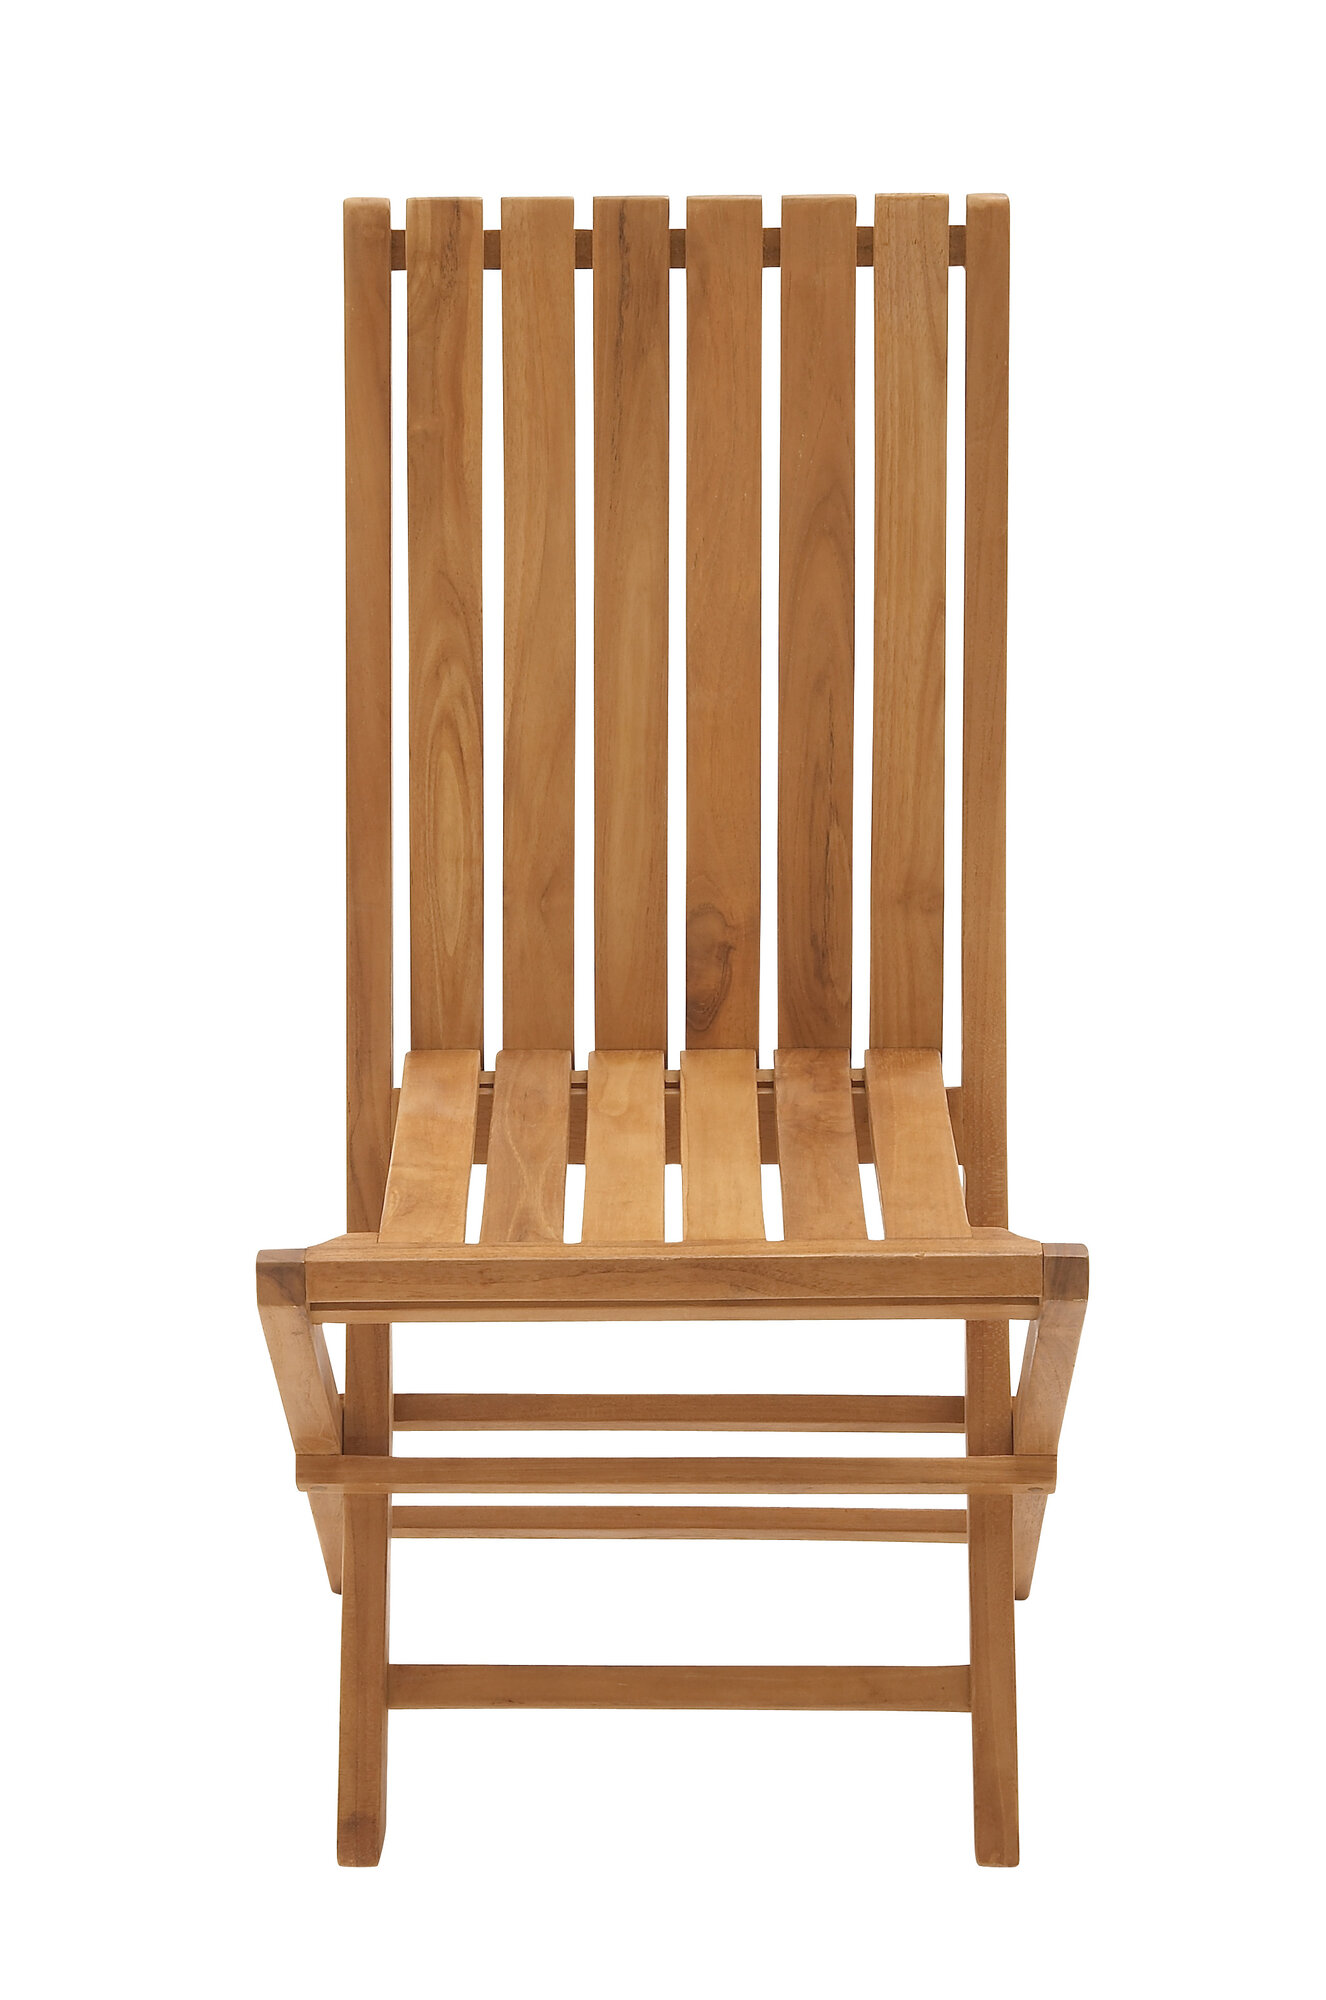 Woodland Imports Portable And Useful Wood Teak Folding Chair EBay